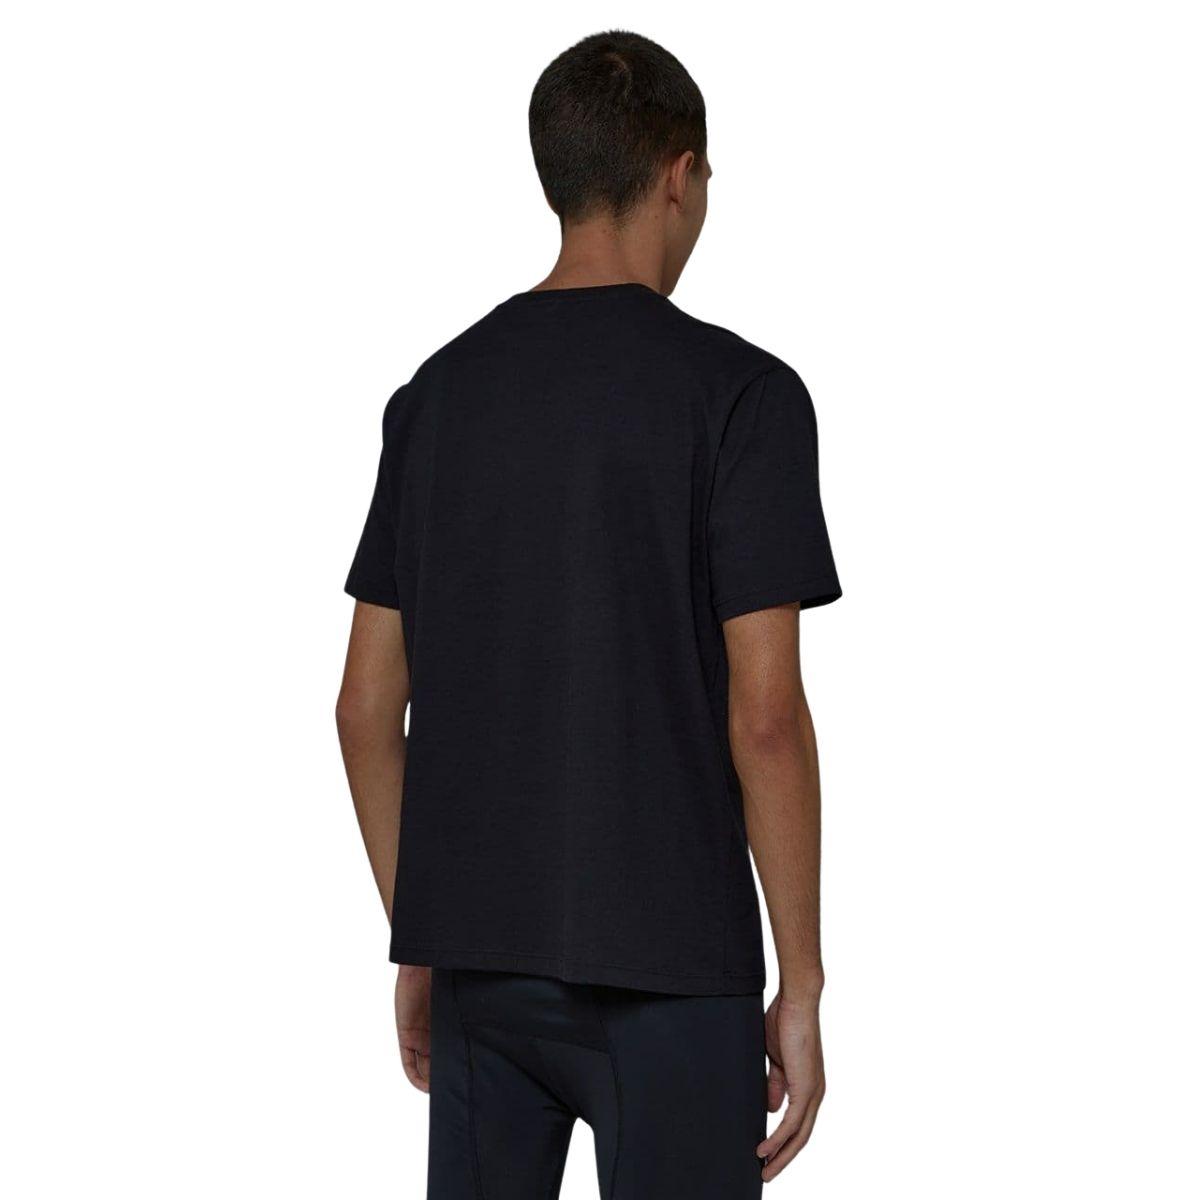 Camiseta John John Medina Gym Rock Reta